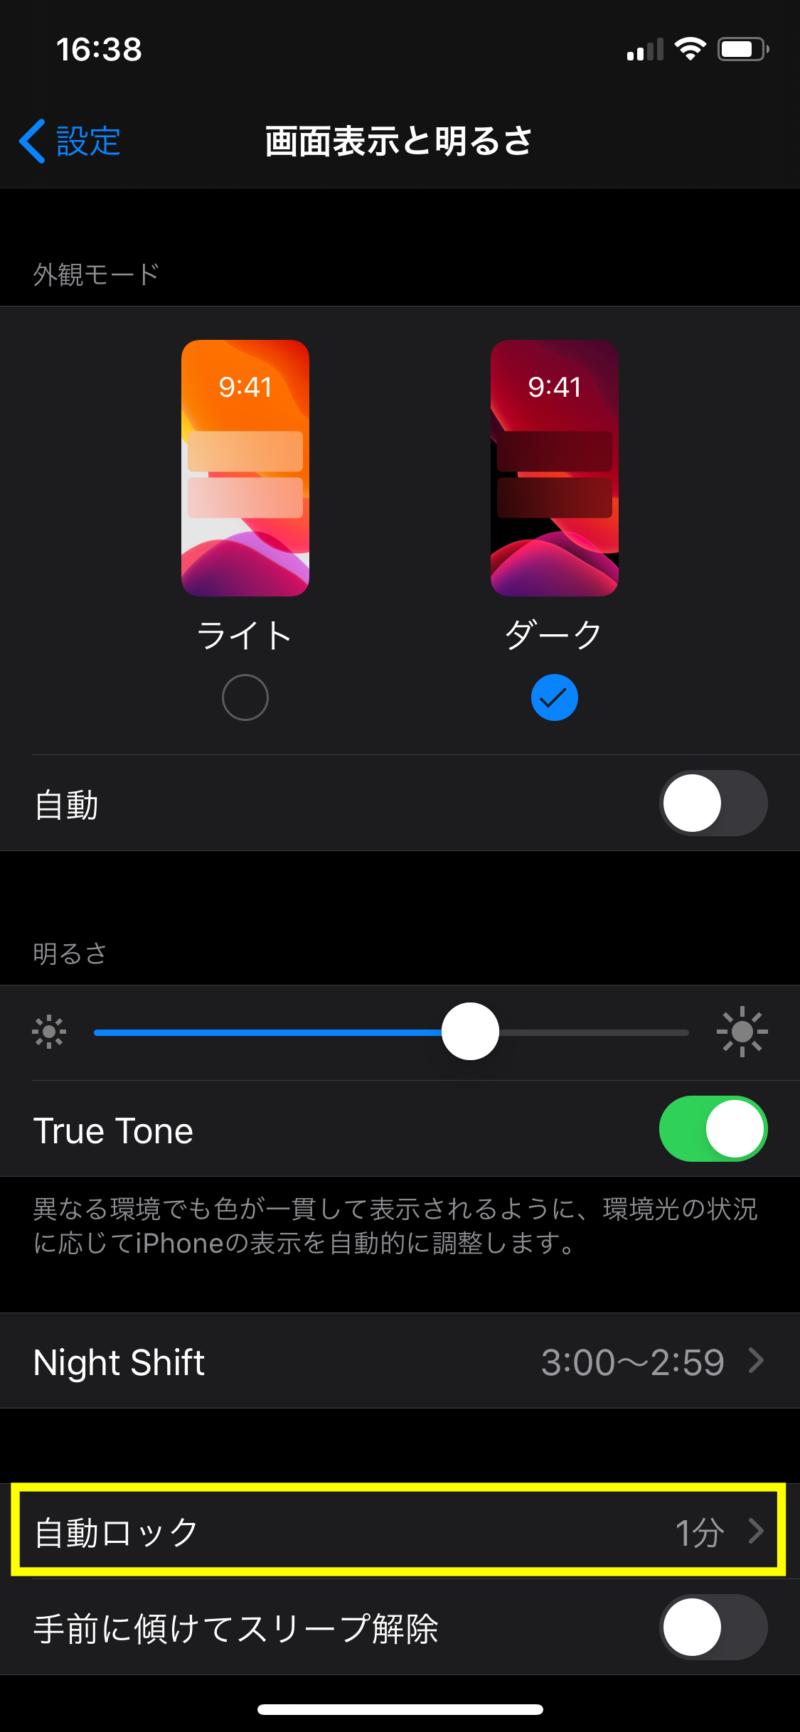 「iPhone 11」「iPhone 11 Pro」 「iPhone 11 Pro Max」の画面が消える(自動ロック)までの時間を変更する方法2